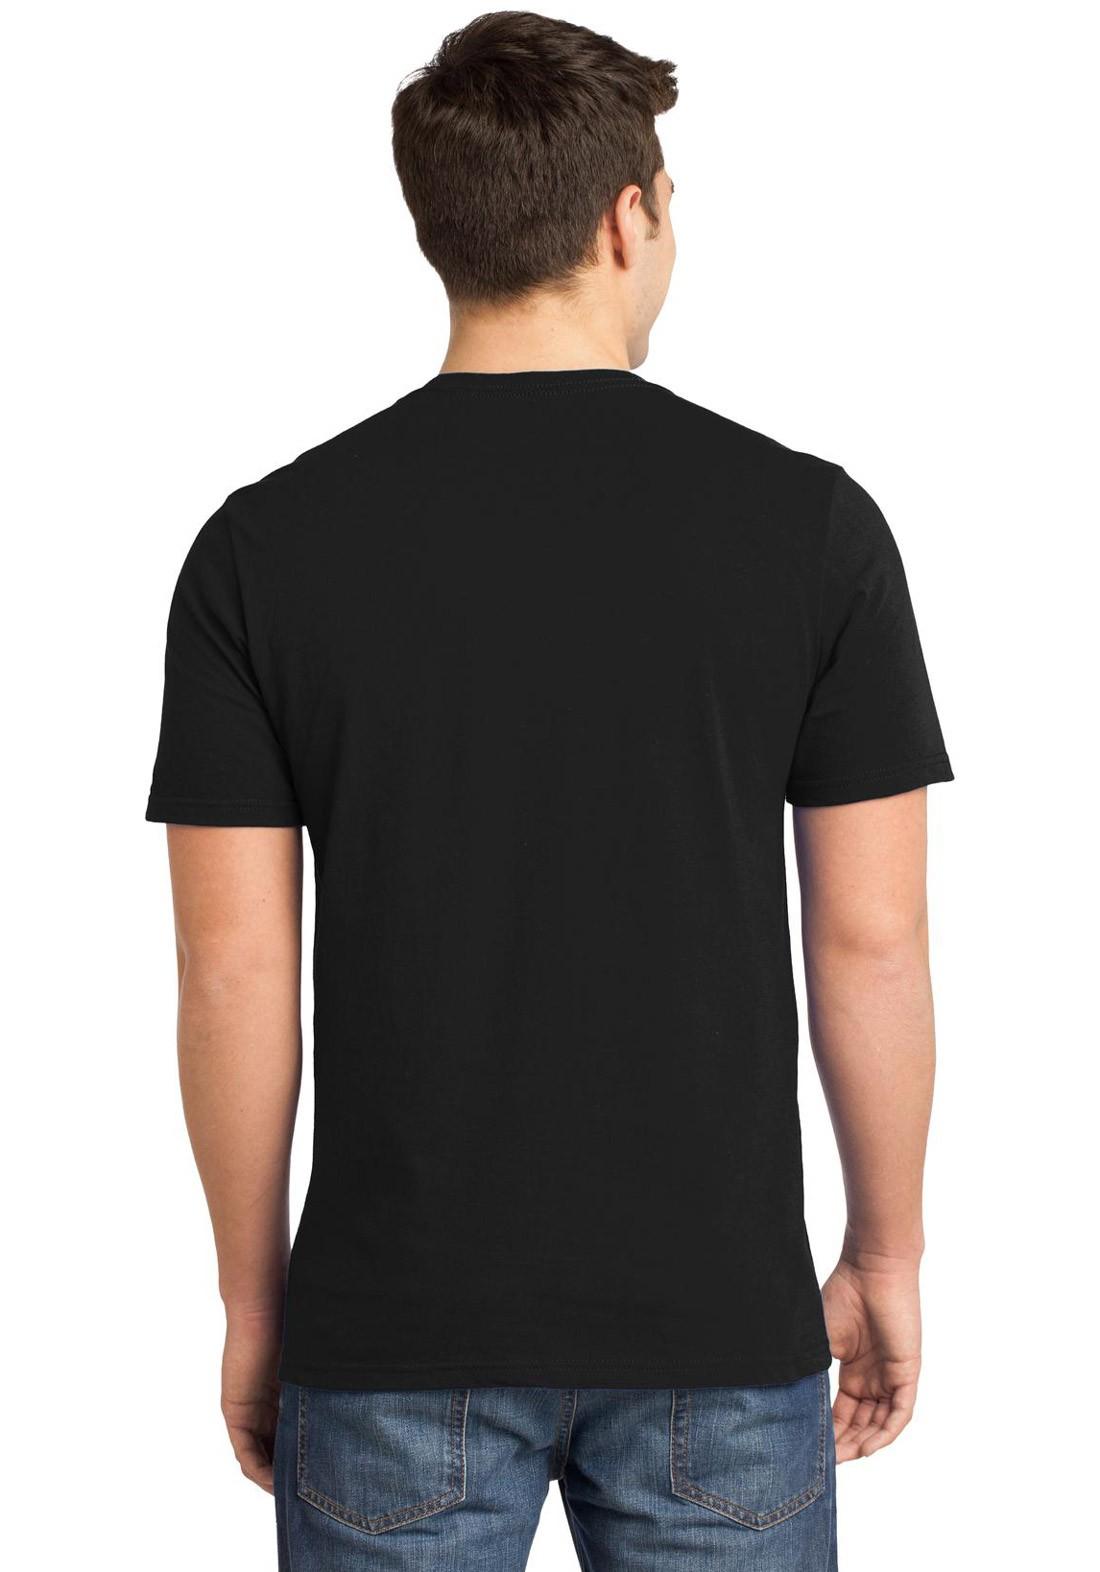 Camiseta Masculina Universitária Faculdade Medicina